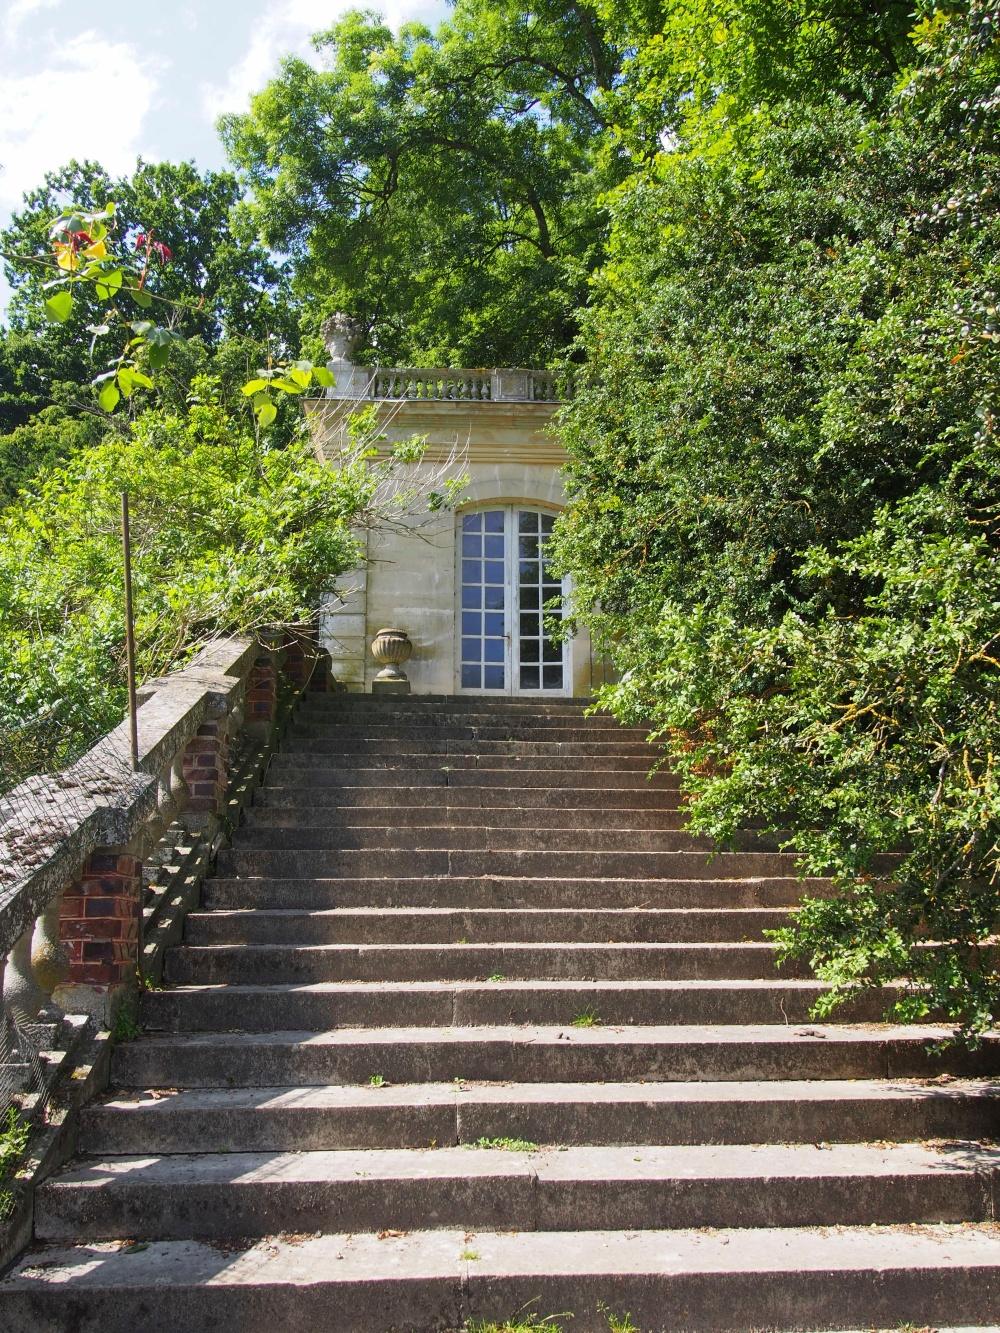 châteausauvagehttps://claireline.wordpress.com